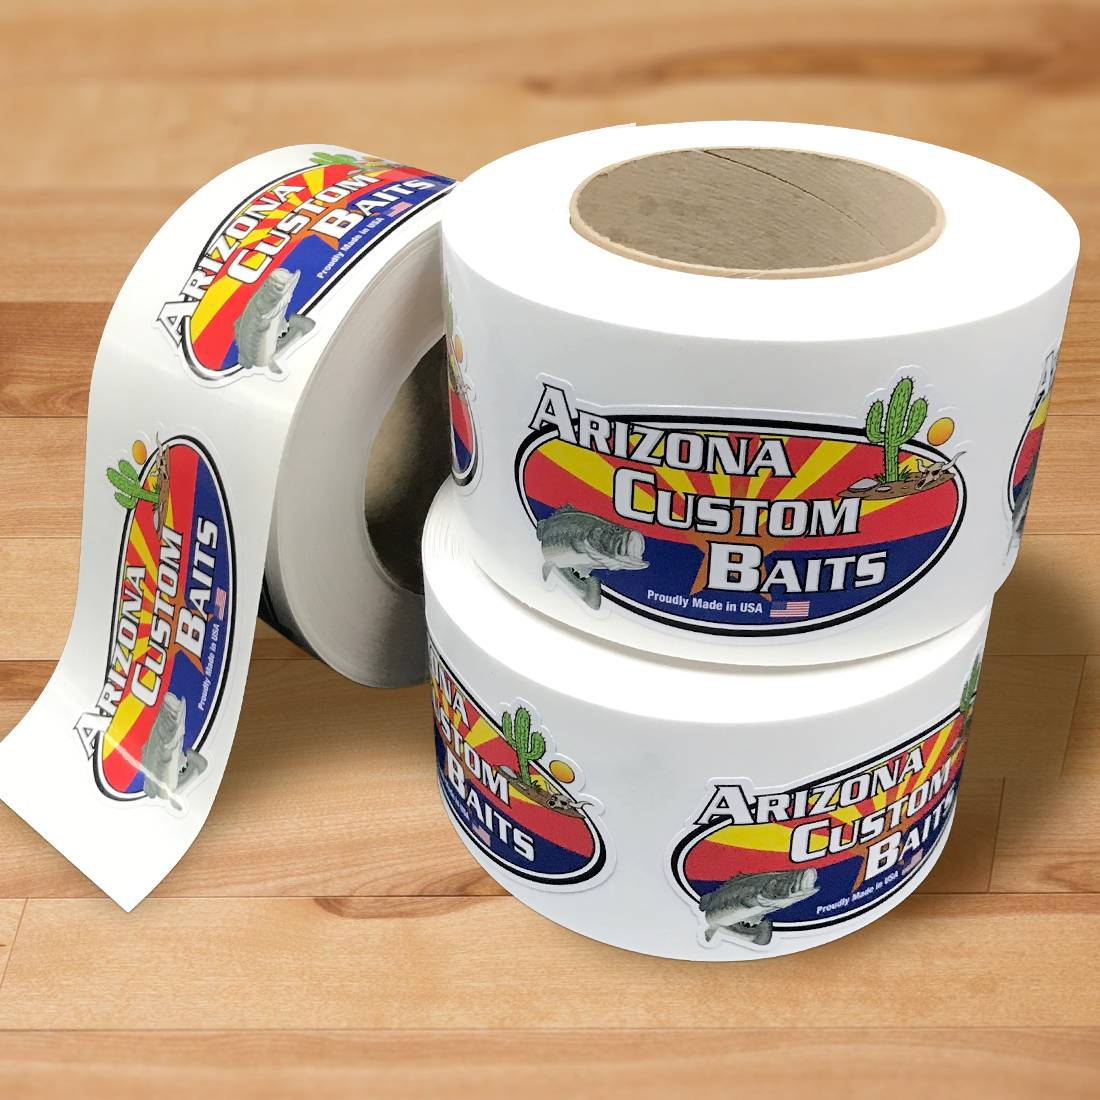 Arizona Custom Baits Oval Stickers